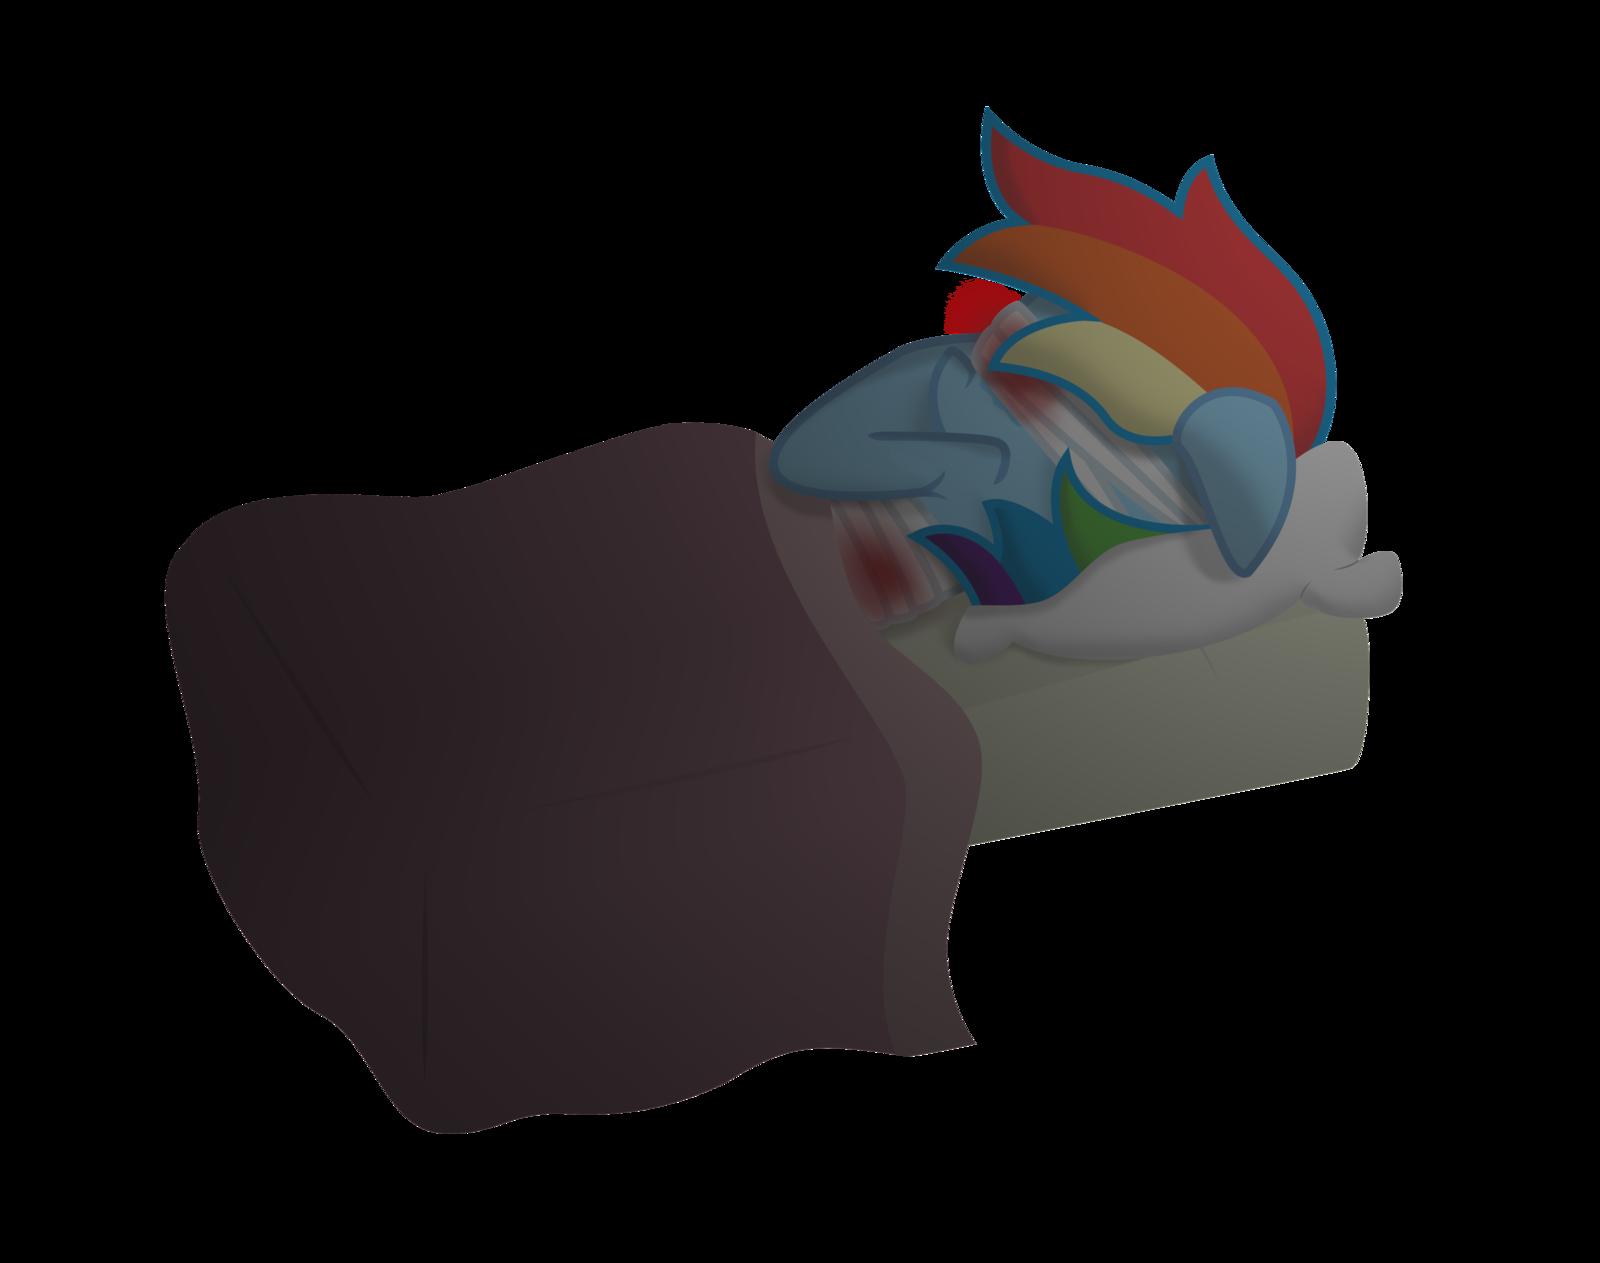 Ox clipart vector. Hurt rainbow dash by